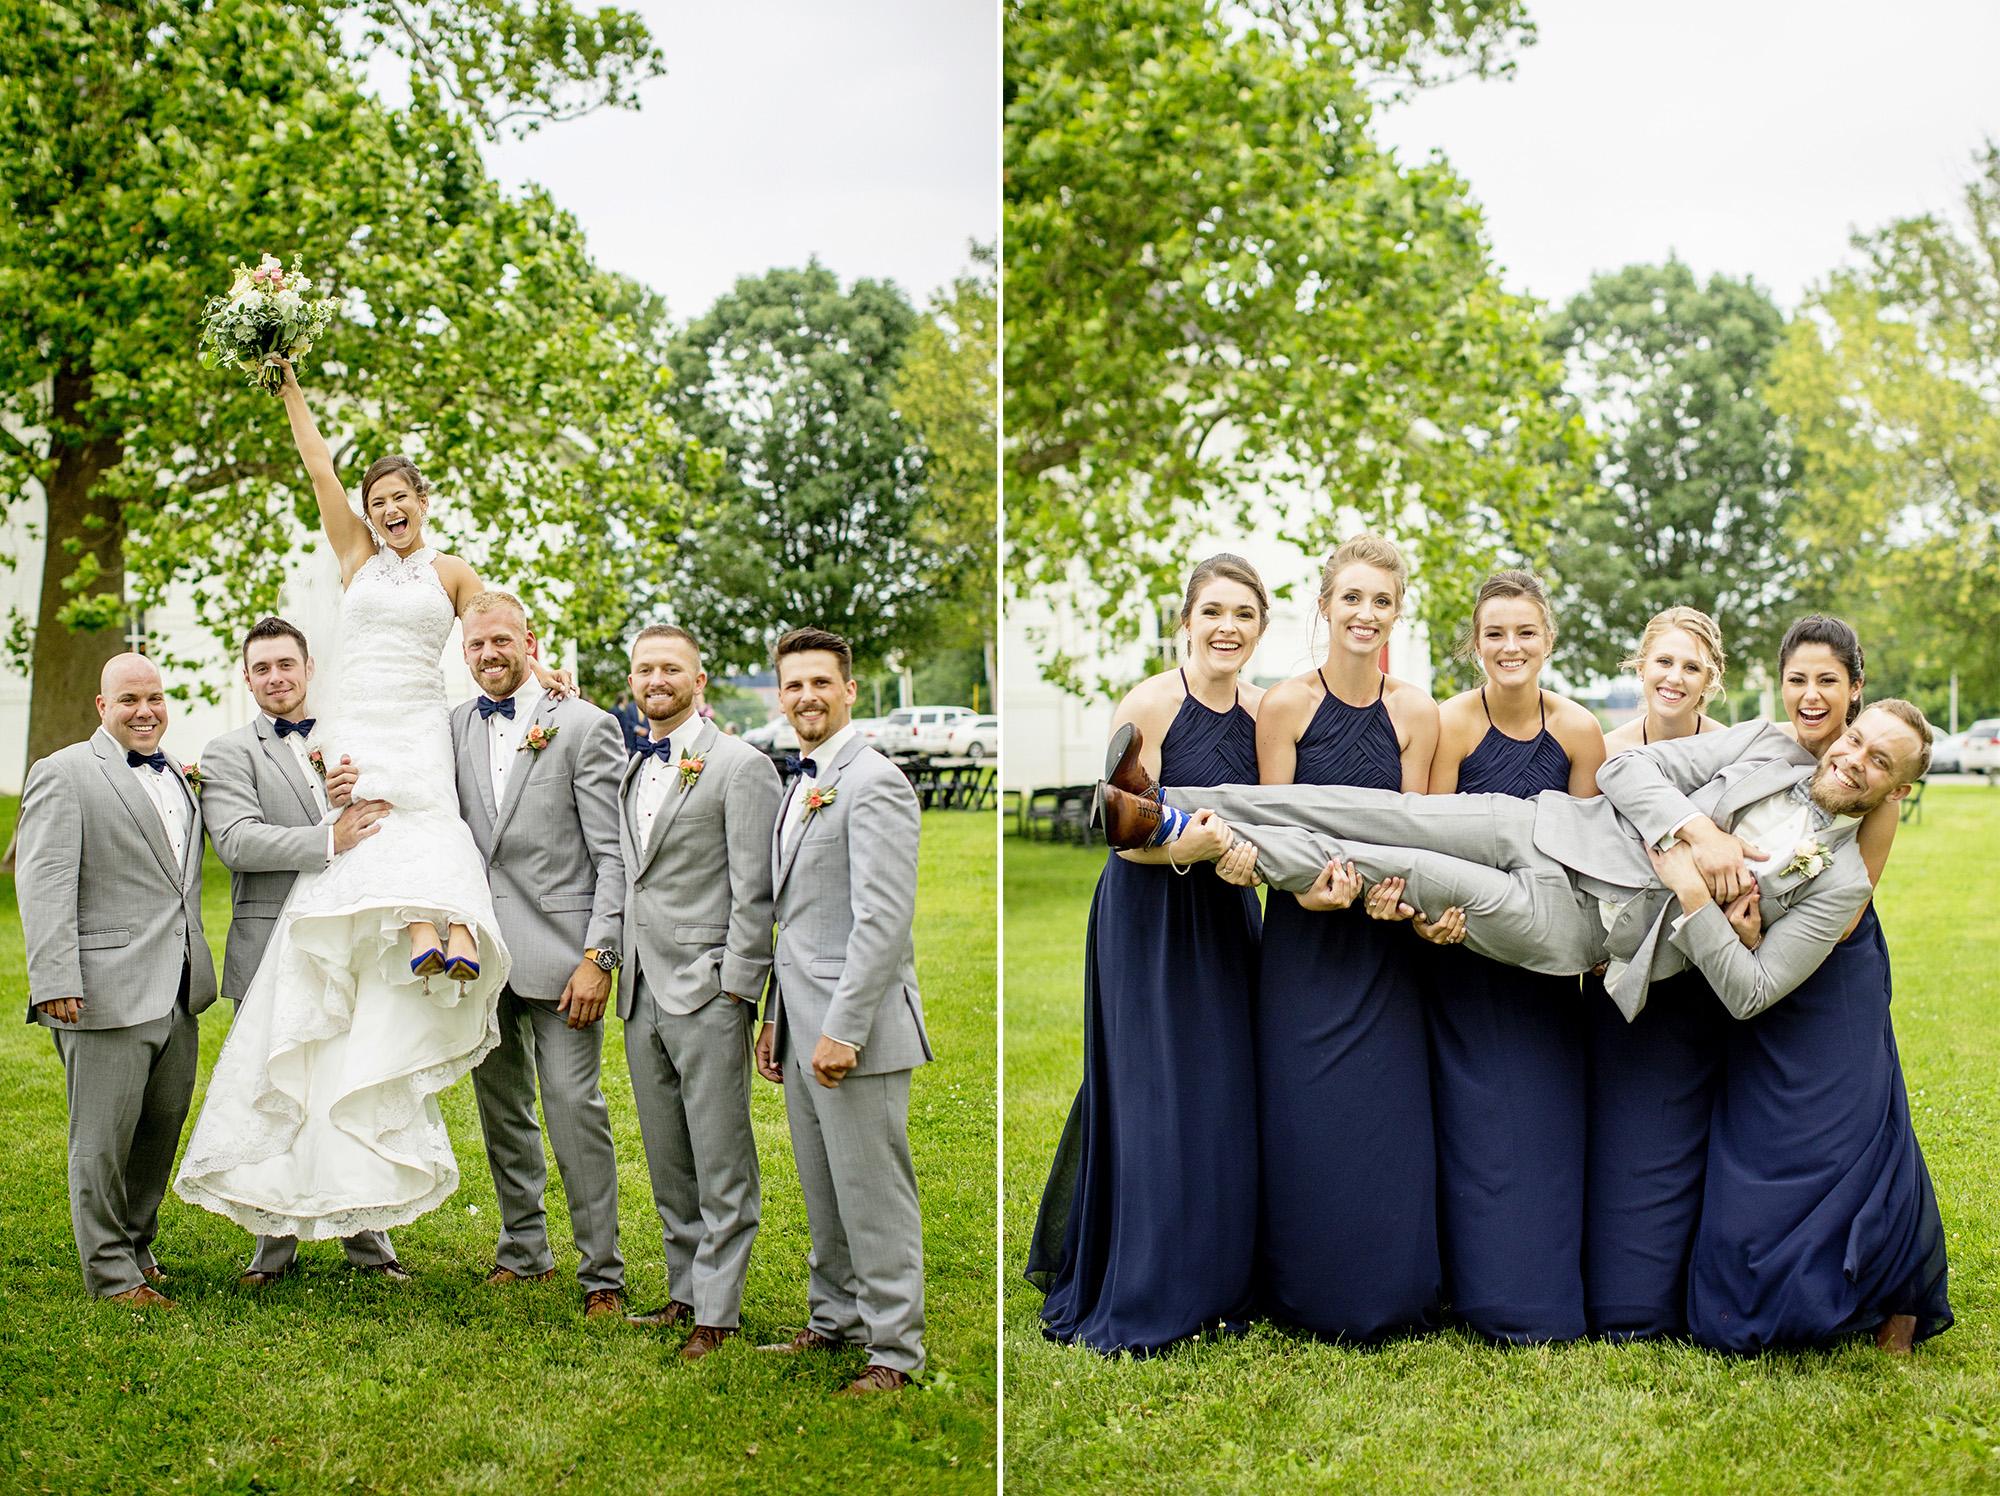 Seriously_Sabrina_Photography_Lexington_Kentucky_Round_Barn_Red_Mile_Stable_of_Memories_Wedding_Hart_81.jpg